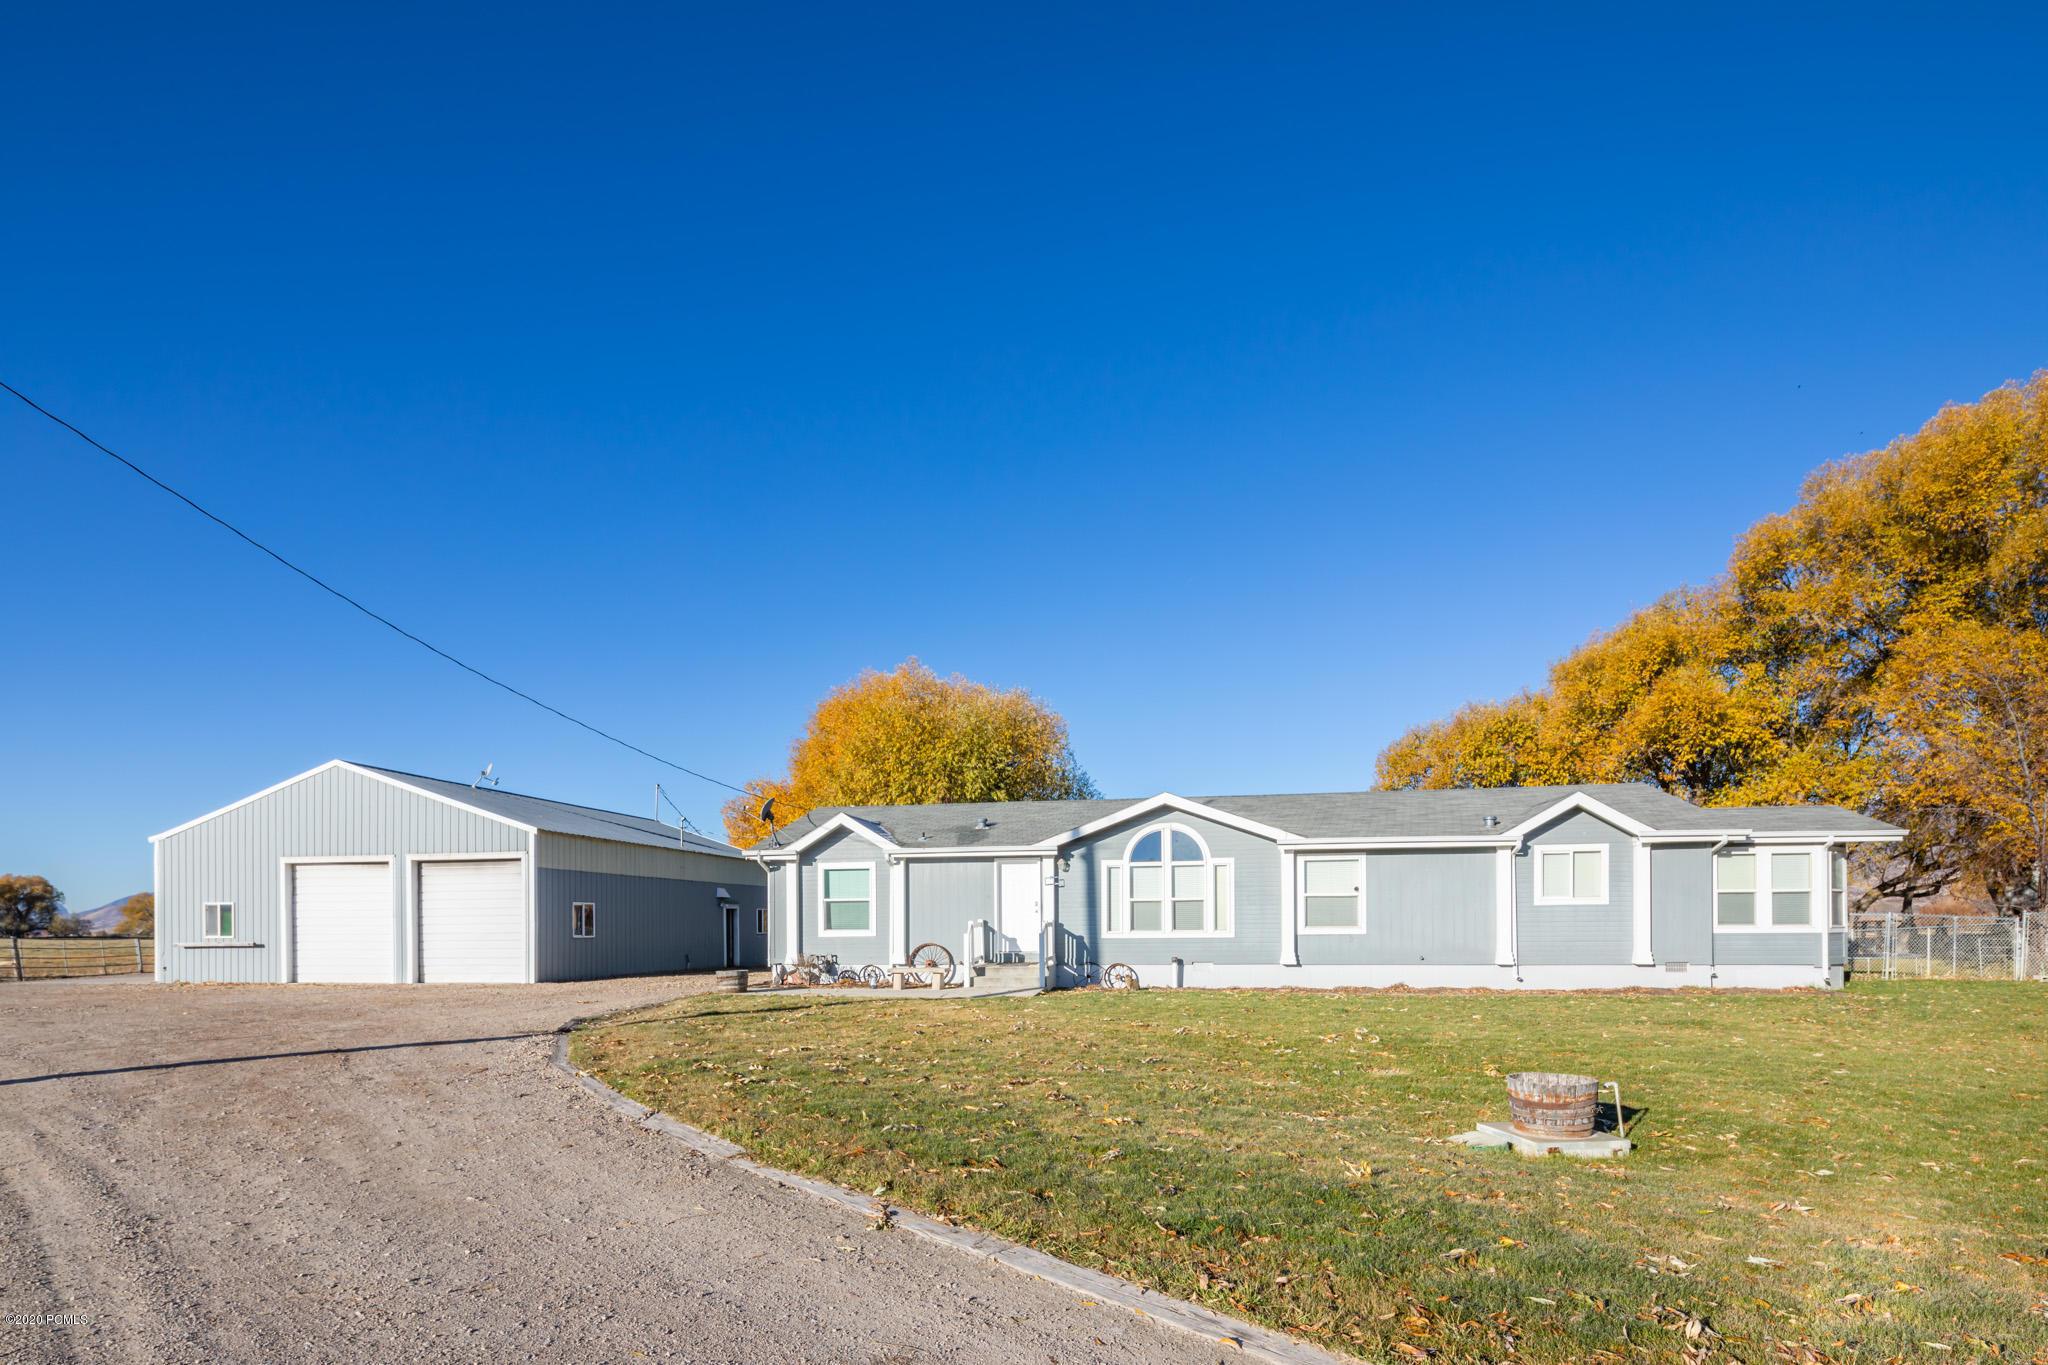 793 500 North, Heber City, Utah 84032, 3 Bedrooms Bedrooms, ,2 BathroomsBathrooms,Single Family,For Sale,500 North,20190109112430415765000000